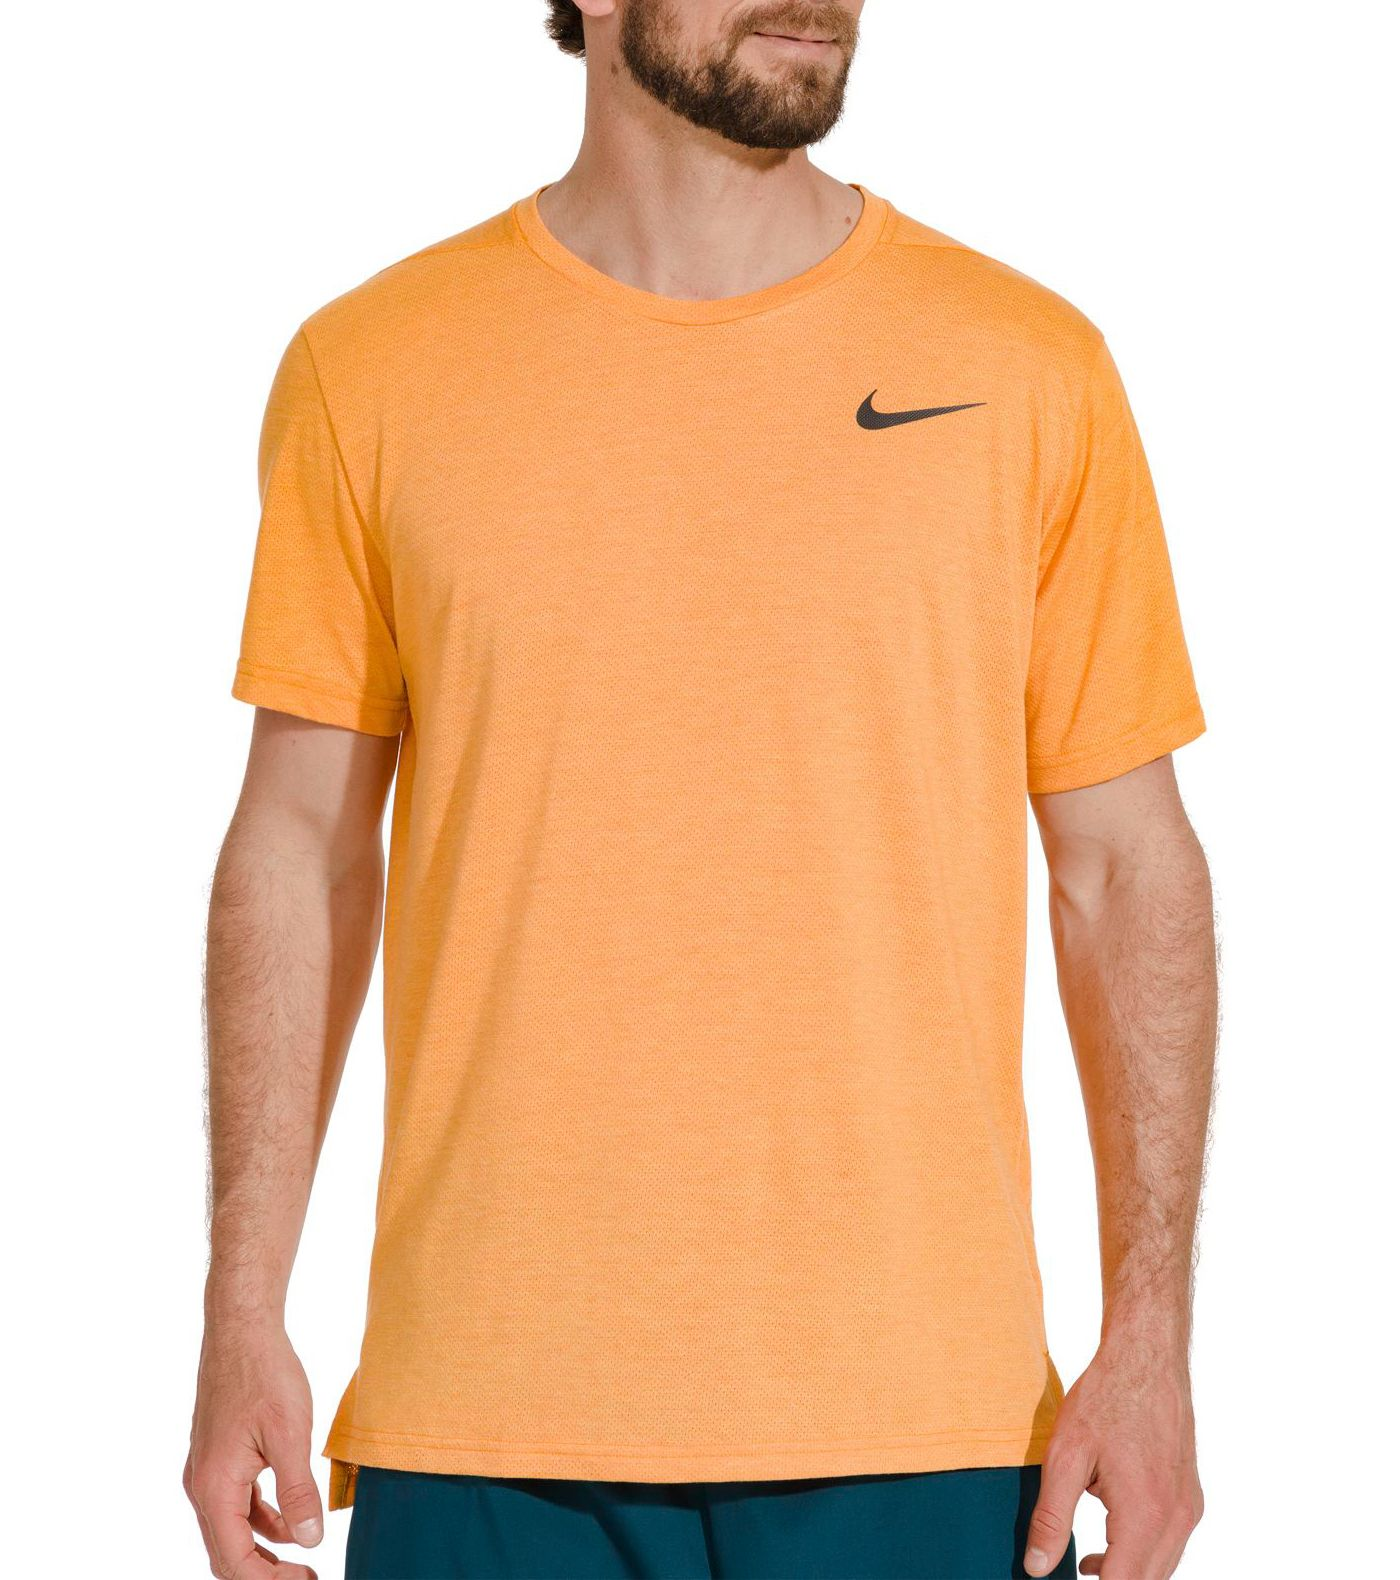 Nike Men's Hyper Dry T-Shirt (Regular and Big & Tall)